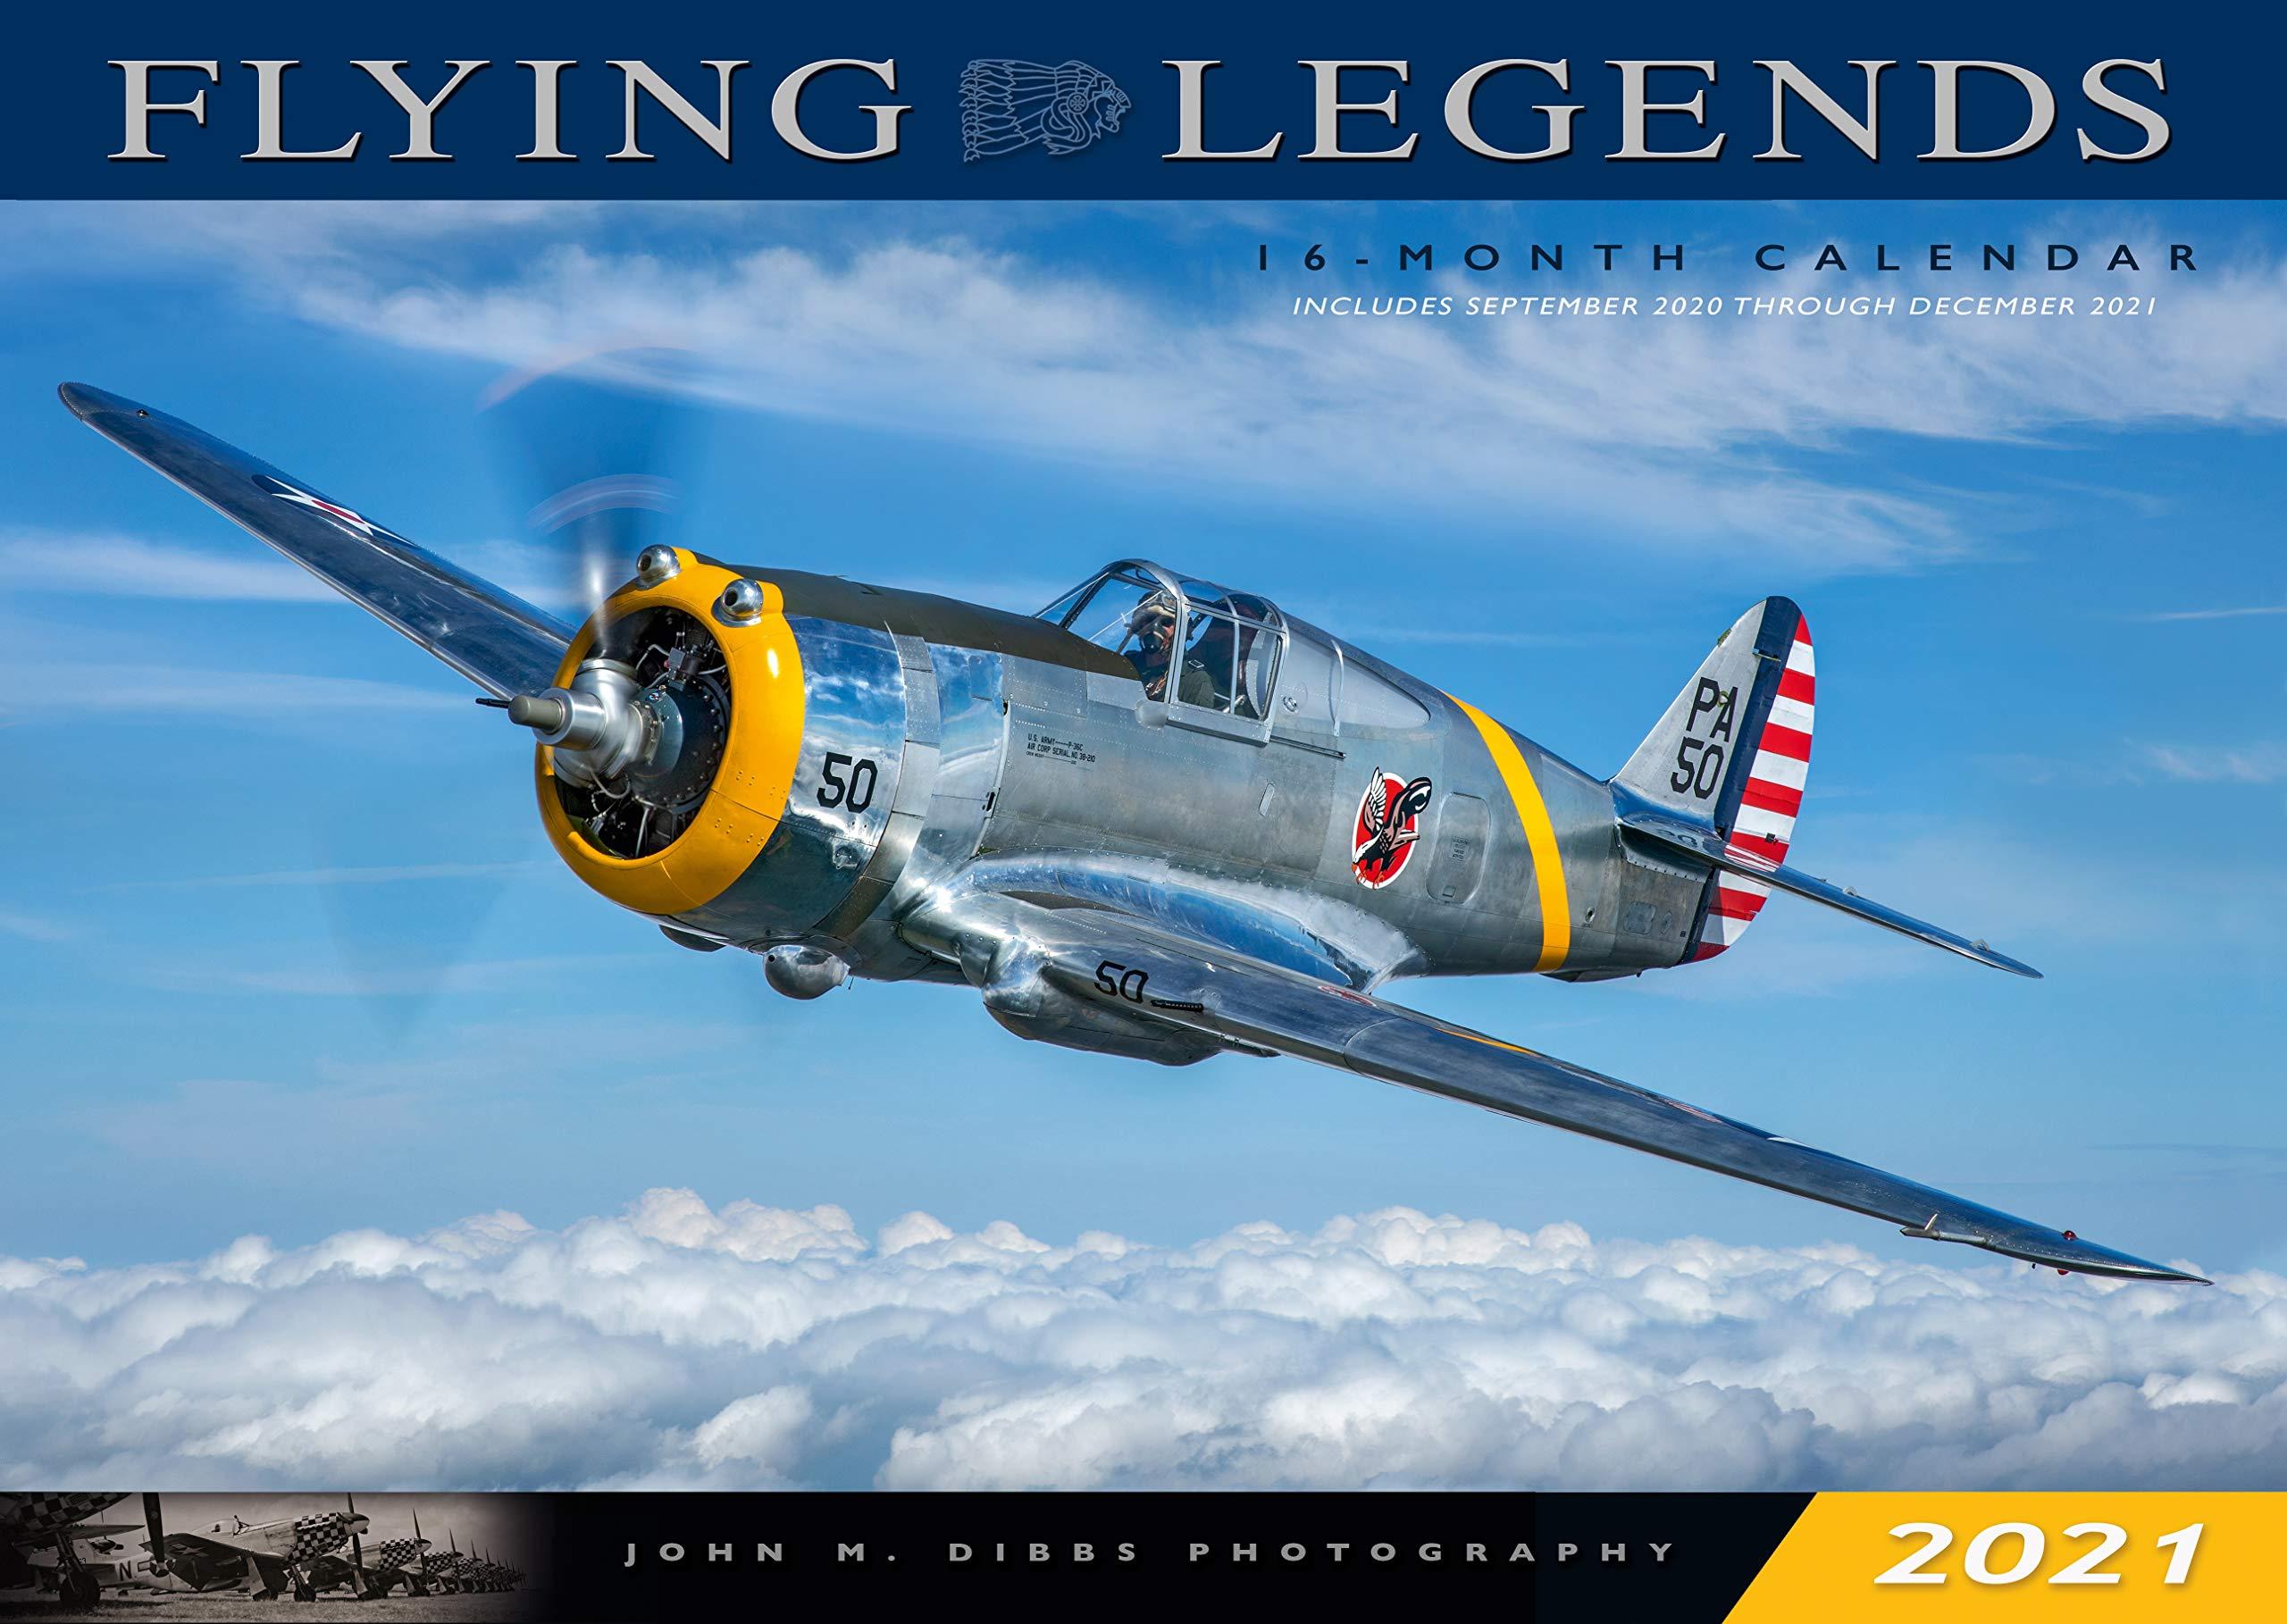 September - December 2021 Calendar Flying Legends 2021: 16 Month Calendar   September 2020 Through